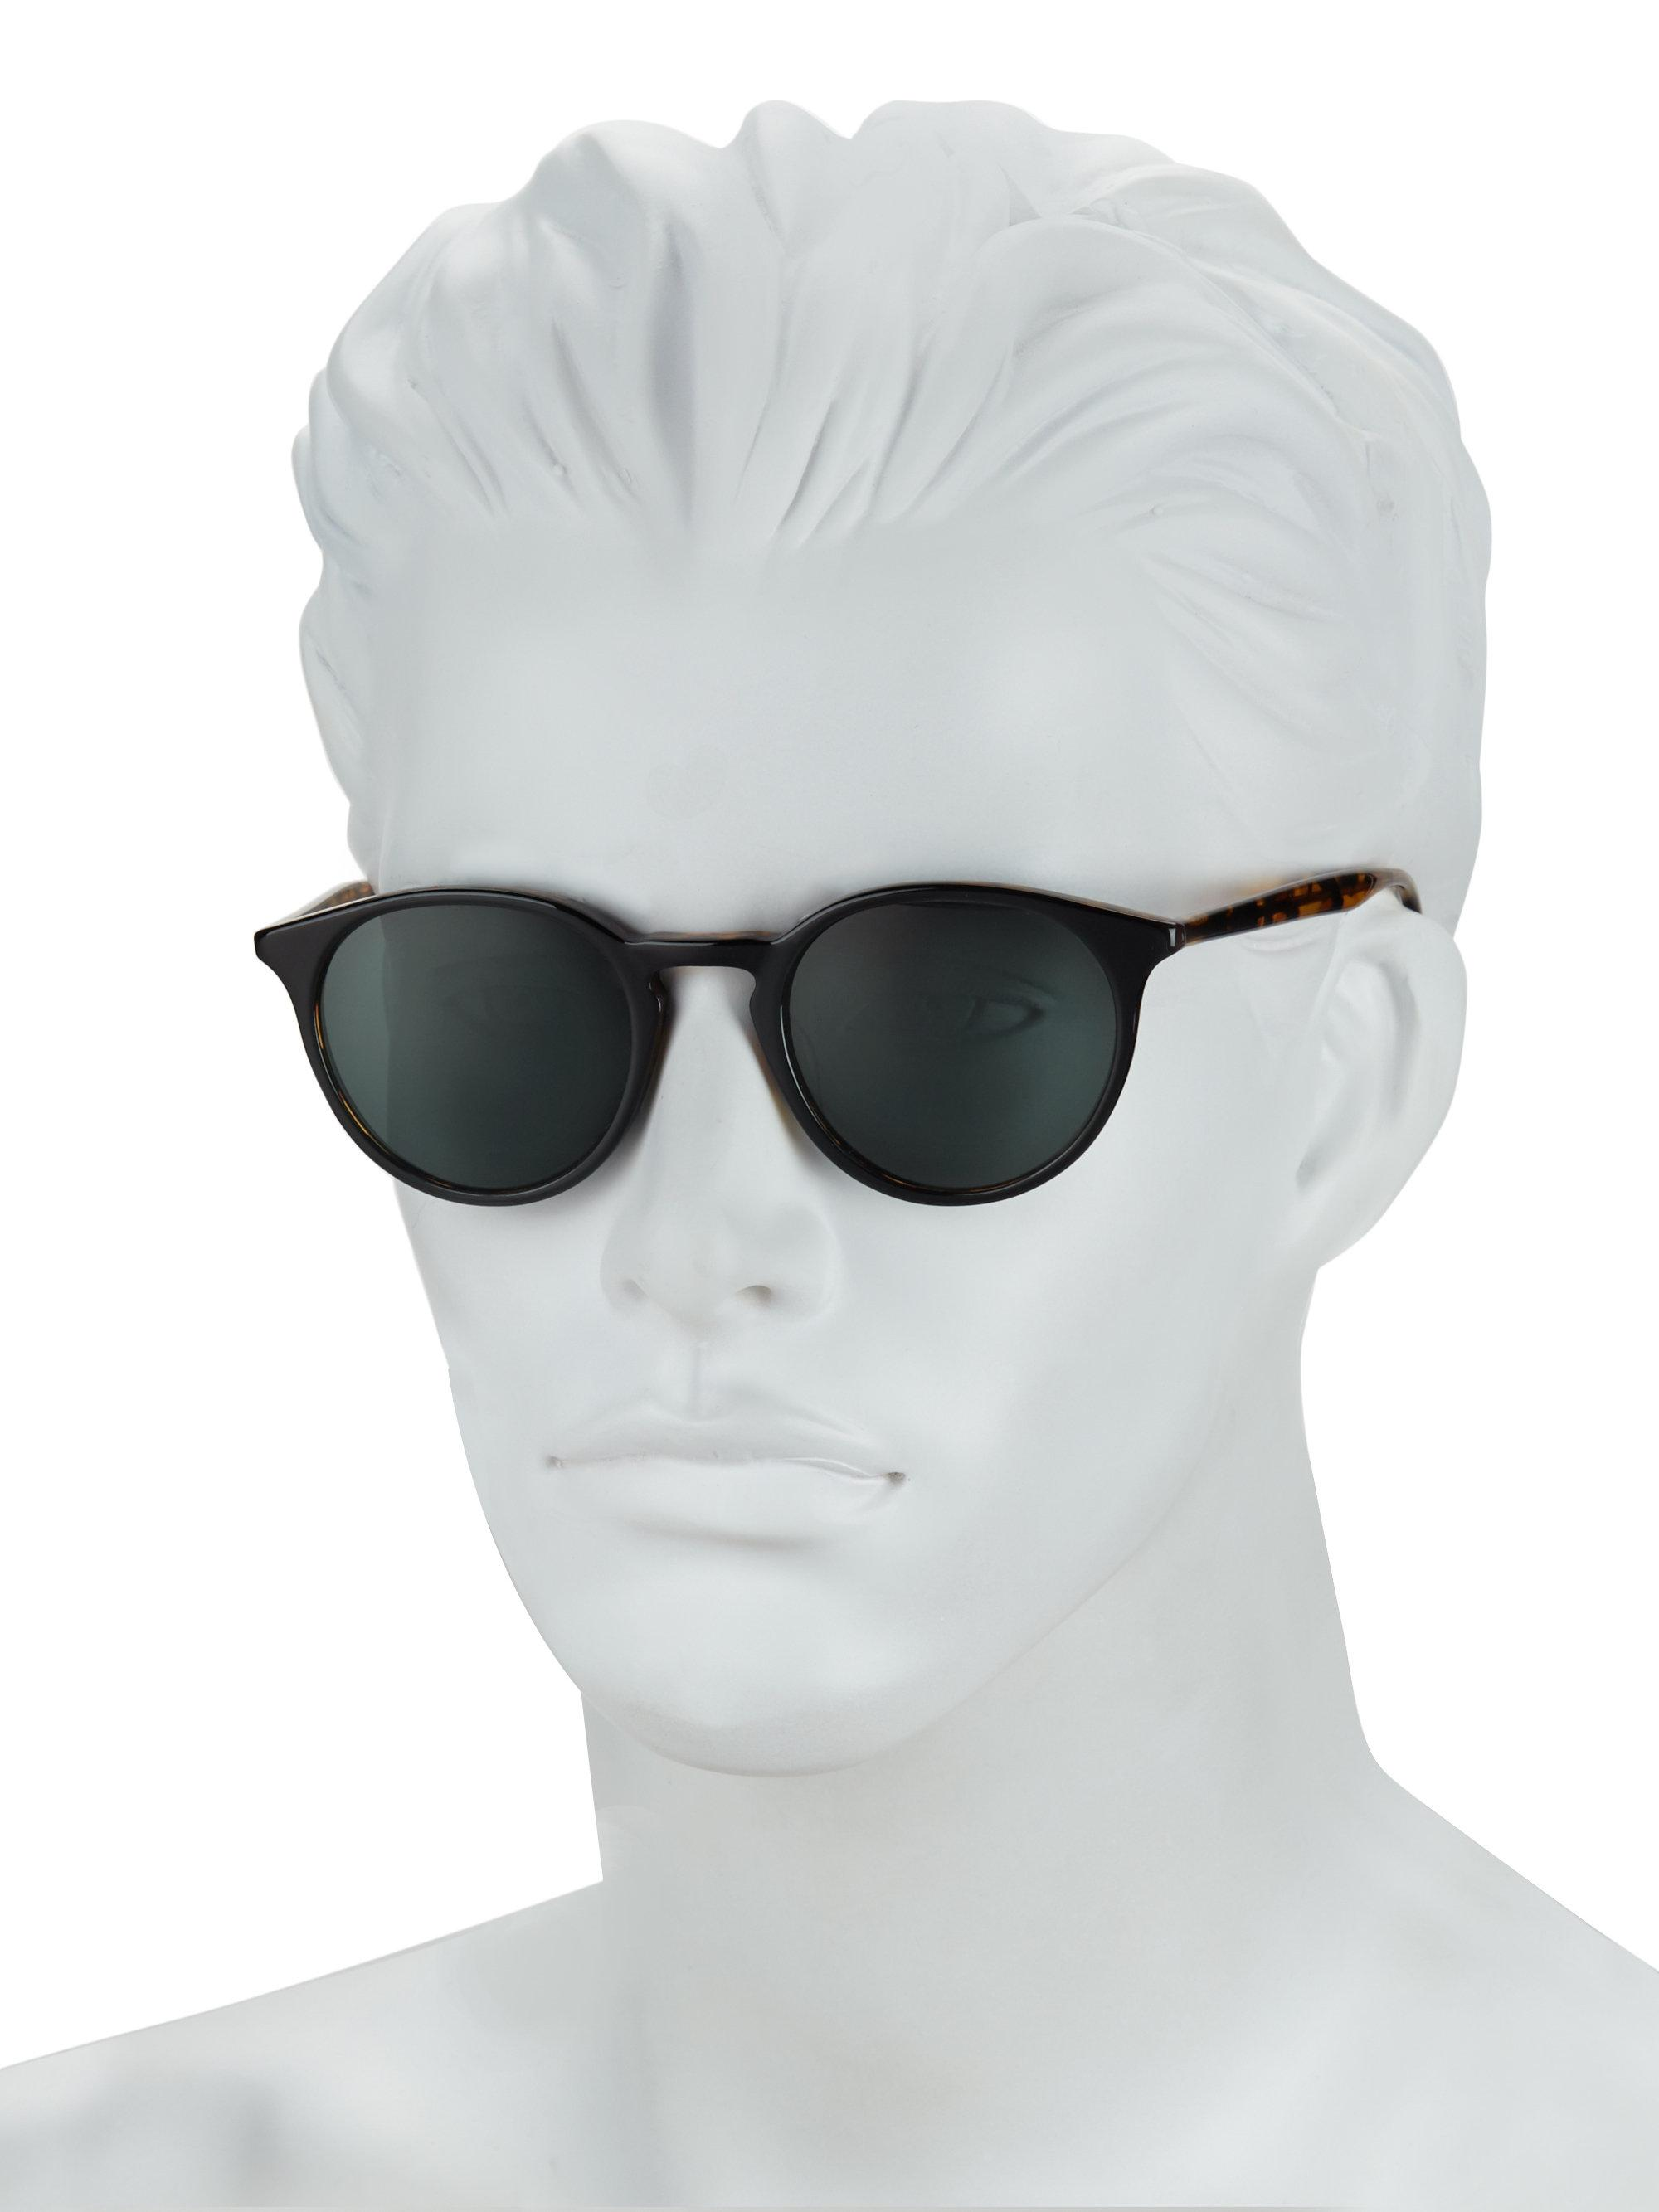 Lyst - Barton Perreira Round Sunglasses for Men